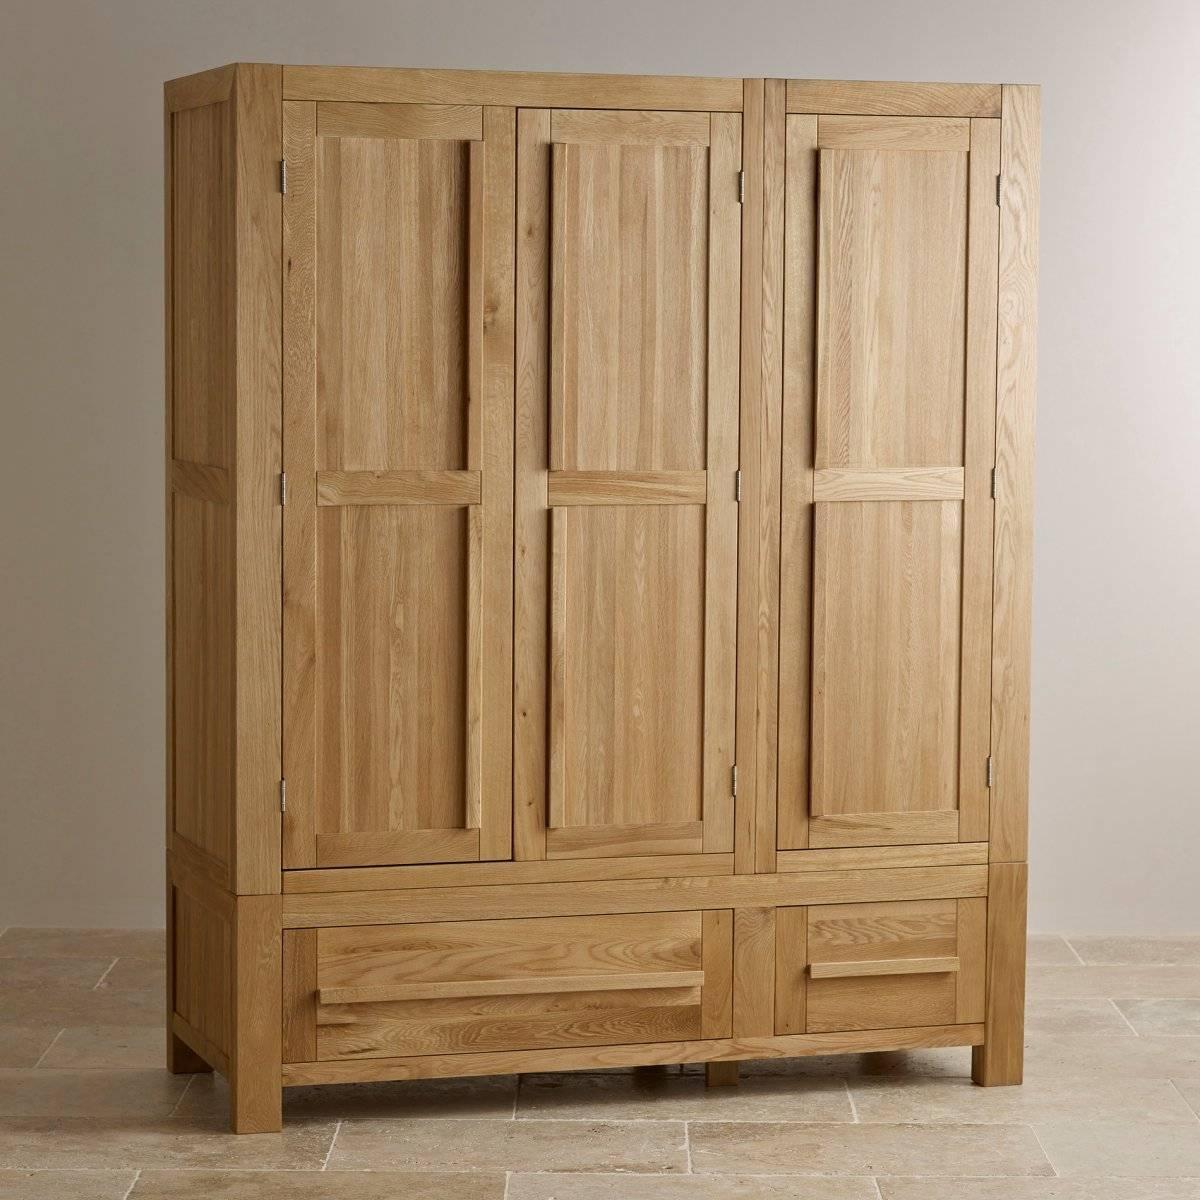 Fresco Natural Solid Oak Triple Wardrobe | Bedroom Furniture intended for Triple Oak Wardrobes (Image 4 of 15)